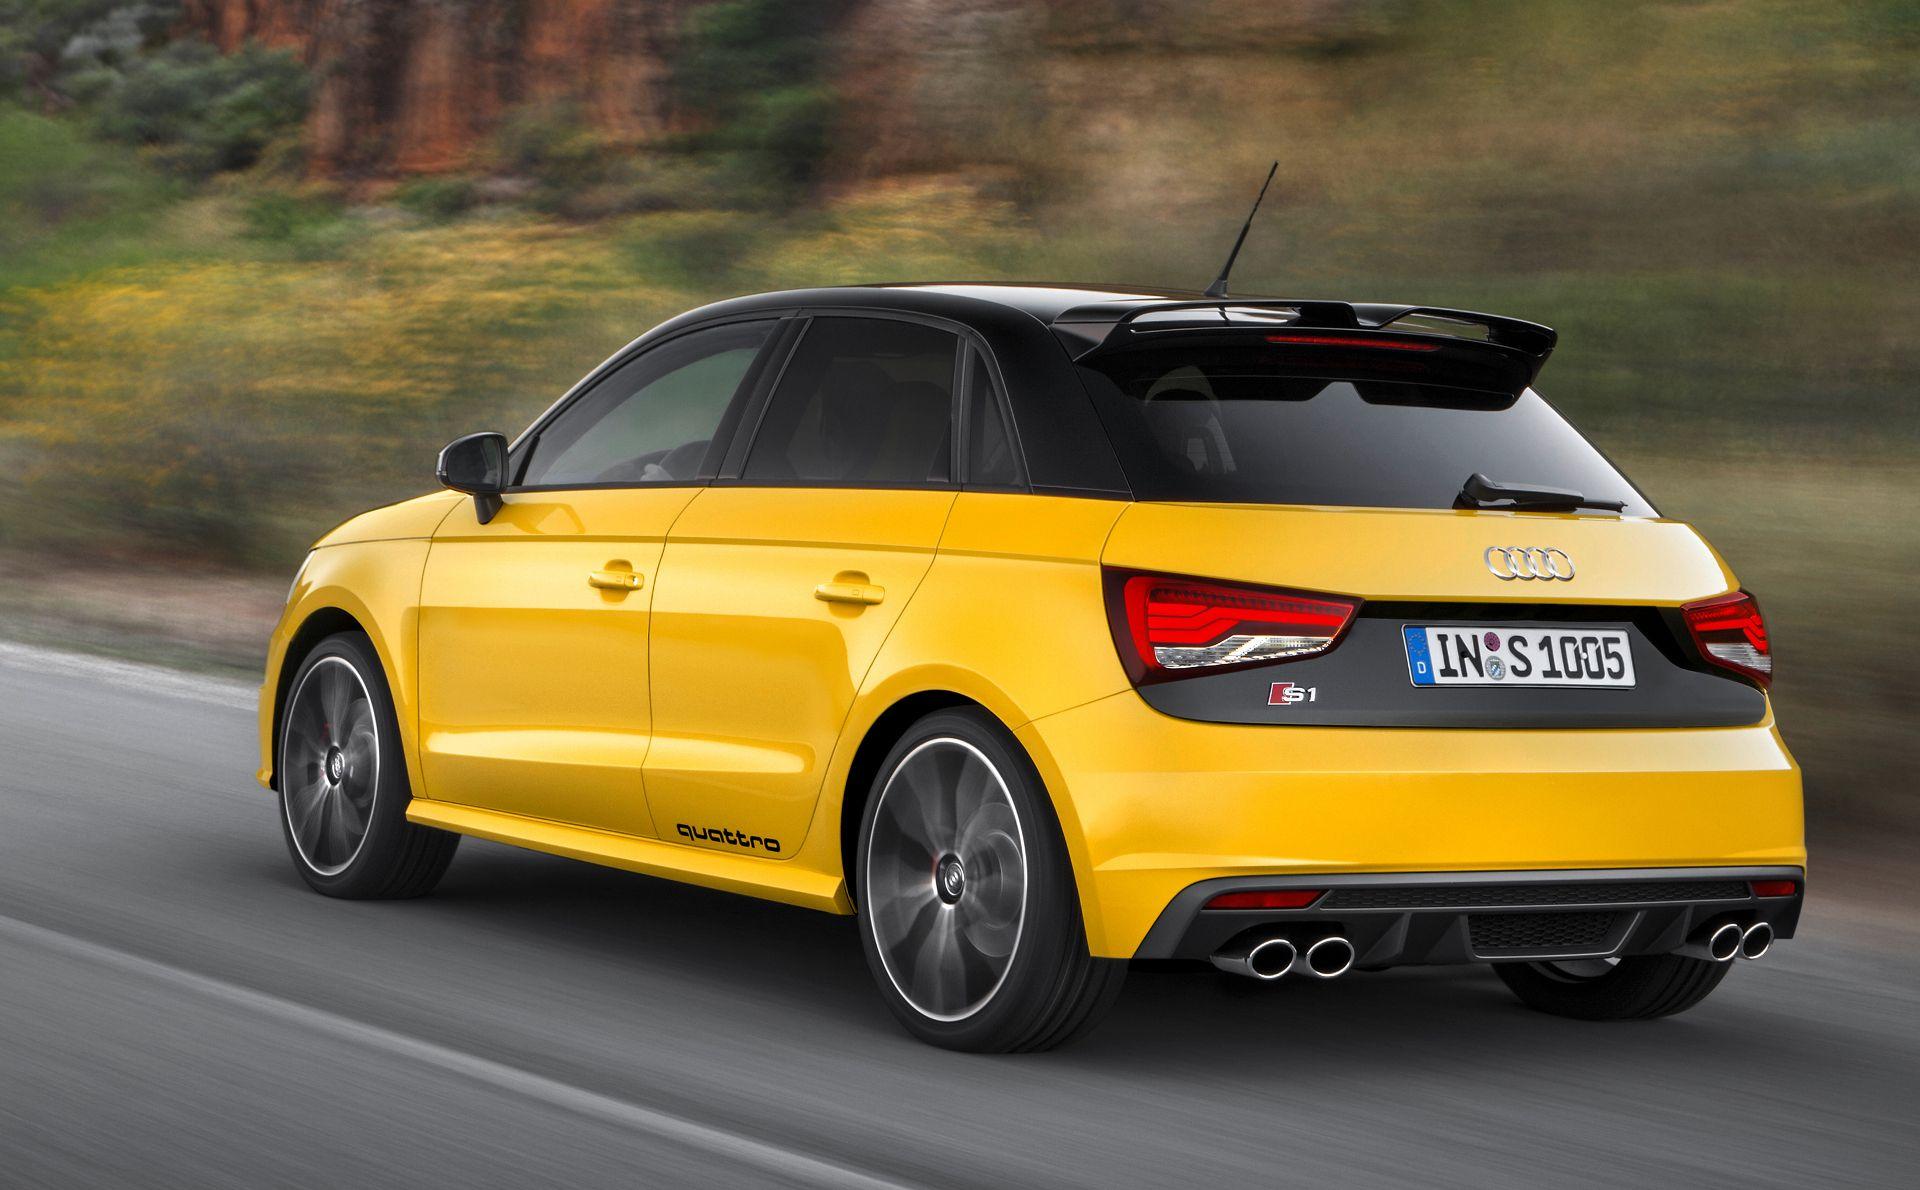 Audi A1 Quattro Most Efficient Gti Audi Wagon Audi Cars Audi